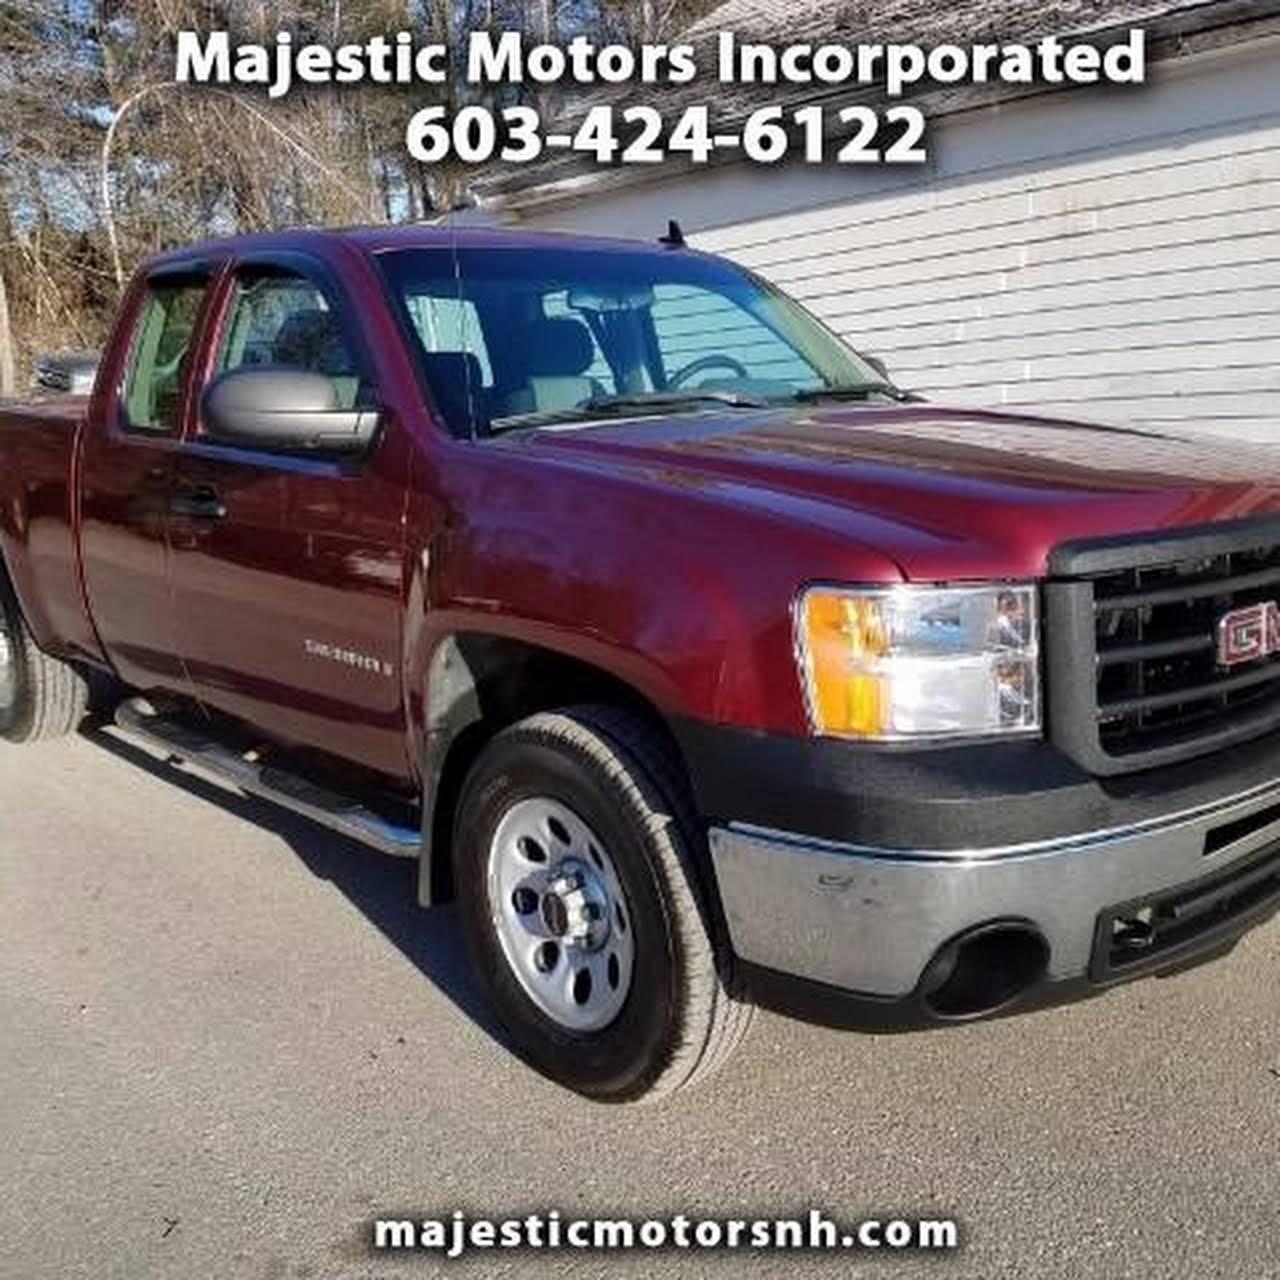 Majestic Motors Merrimack Nh Impremedia Net